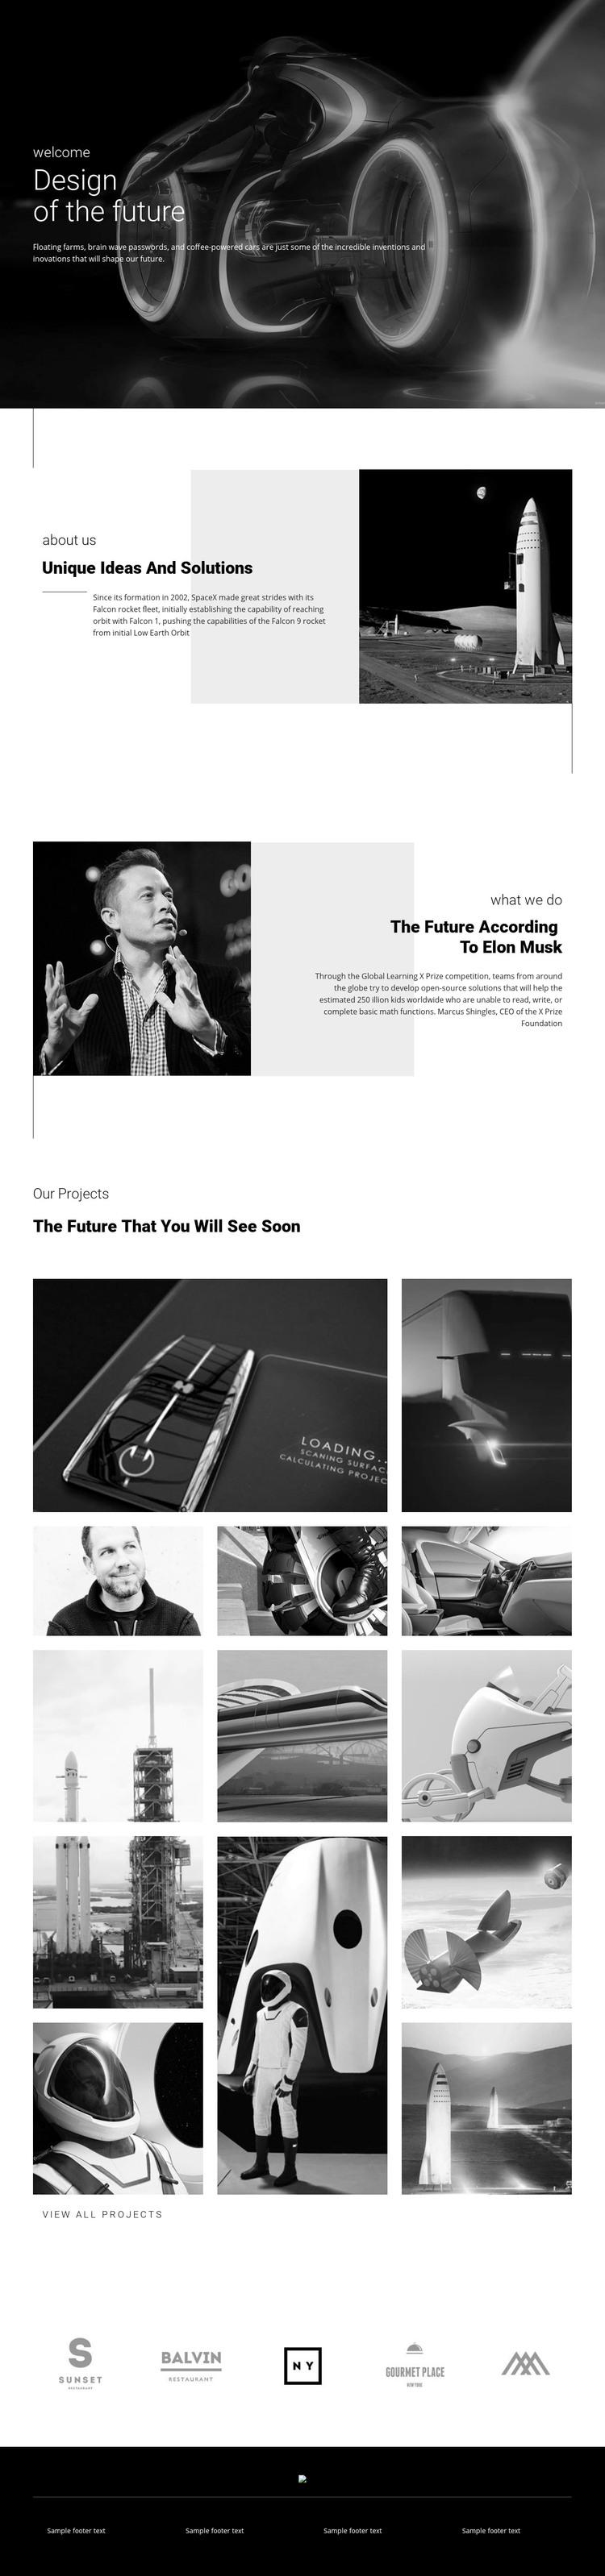 Design of future technology WordPress Website